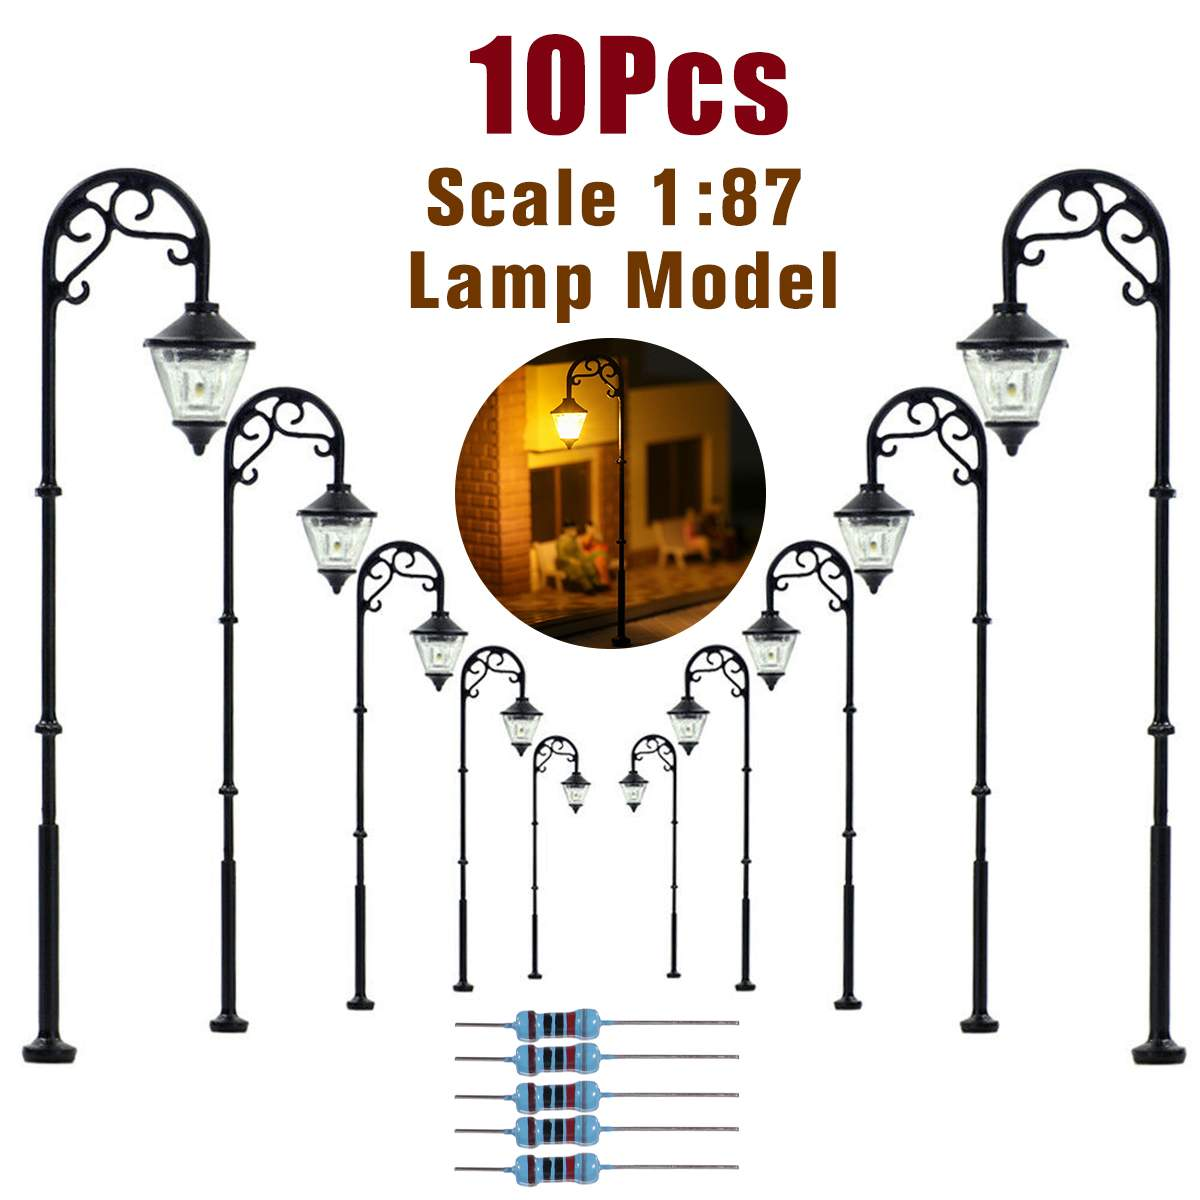 10pcs 1:87 HO Scale Retro Model Street Lamp Layout Lamppost Garden Landscape Light Railway Train Lamp Micro Landscape Decor